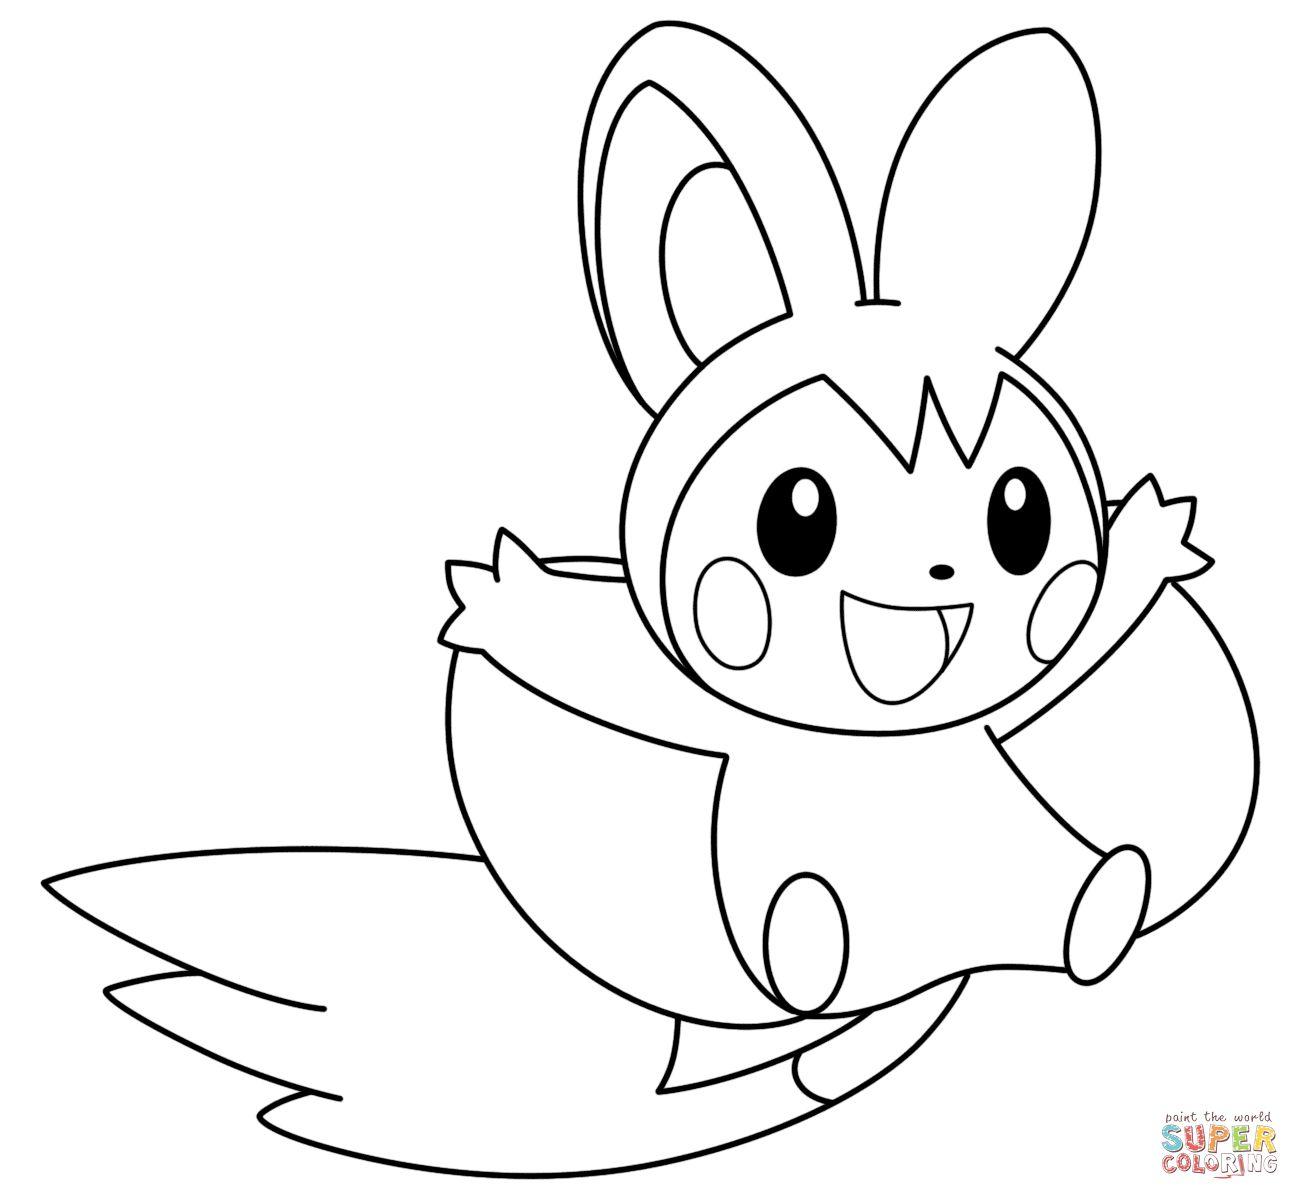 1300x1200 Pokemon Coloring Page